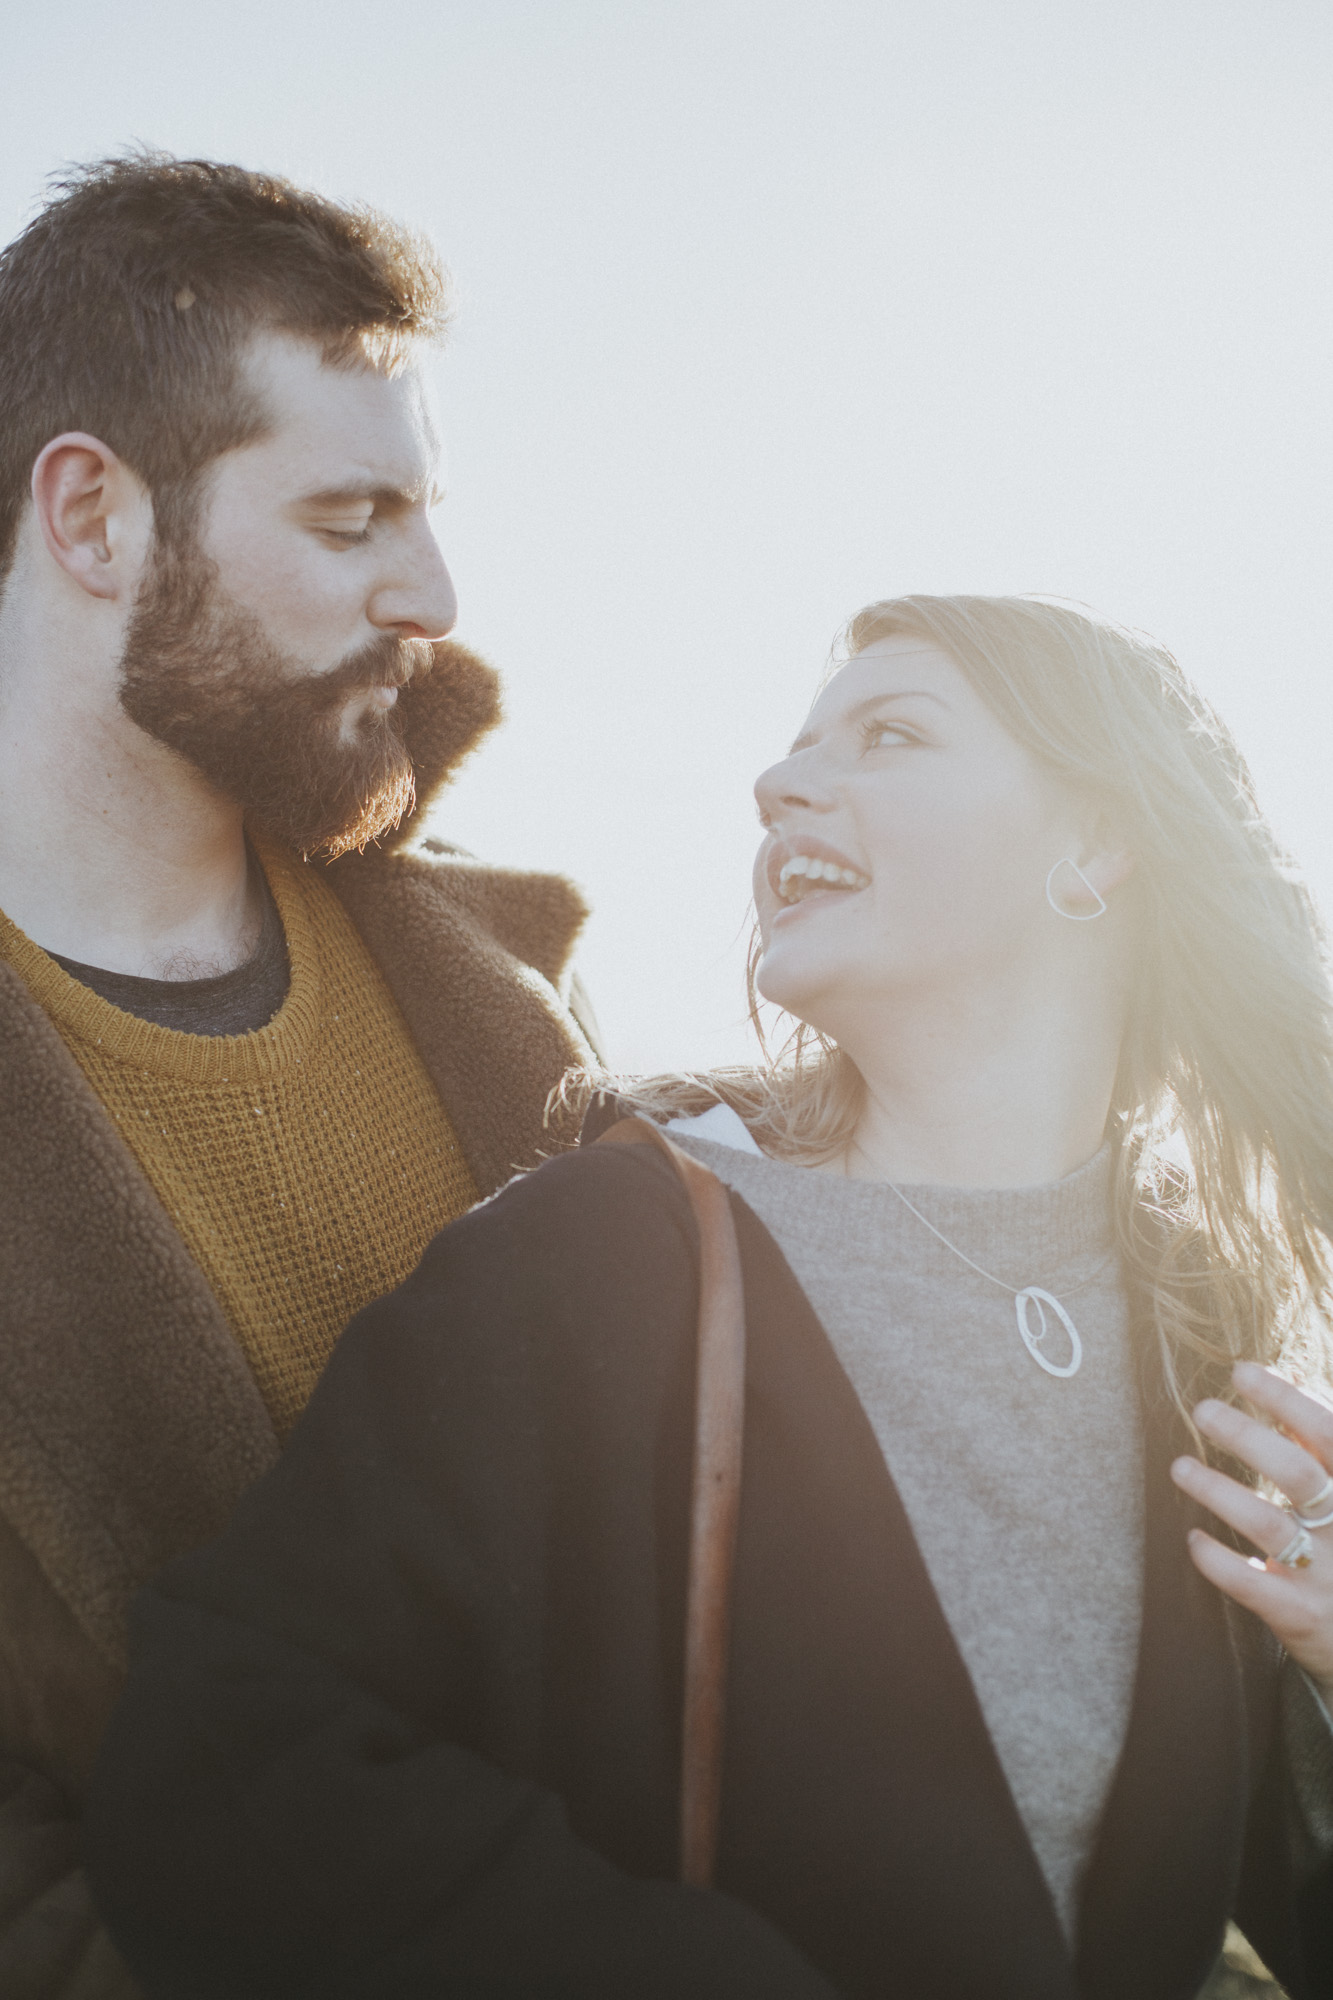 Edinburgh Couple Photoshoot in Holyrood Park by Ceranna Photography | Edinburgh Wedding and Elopement Photographer | Scottish nature